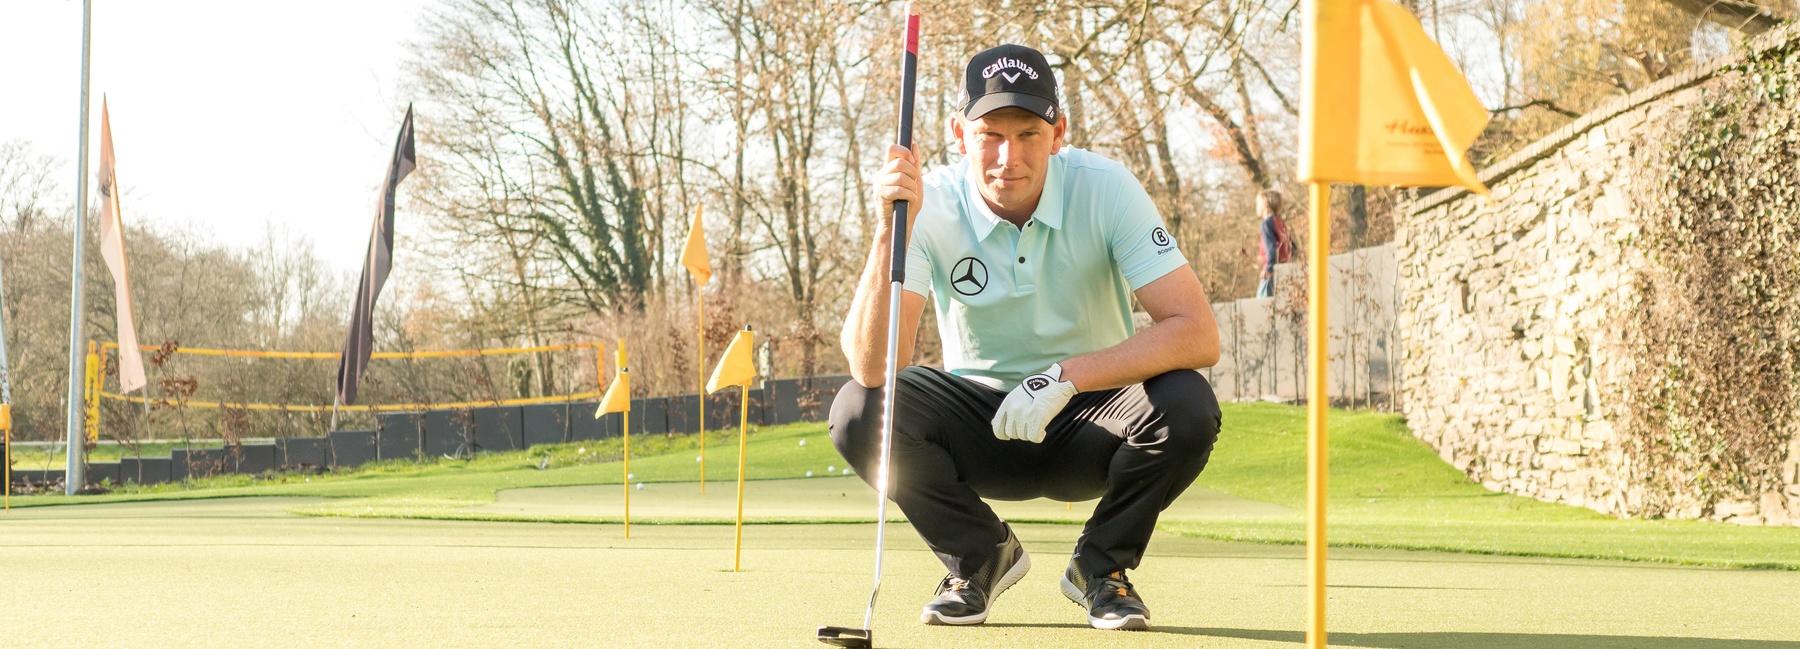 Huxley Golf and Marcel Siem cropAnnounce Partnership